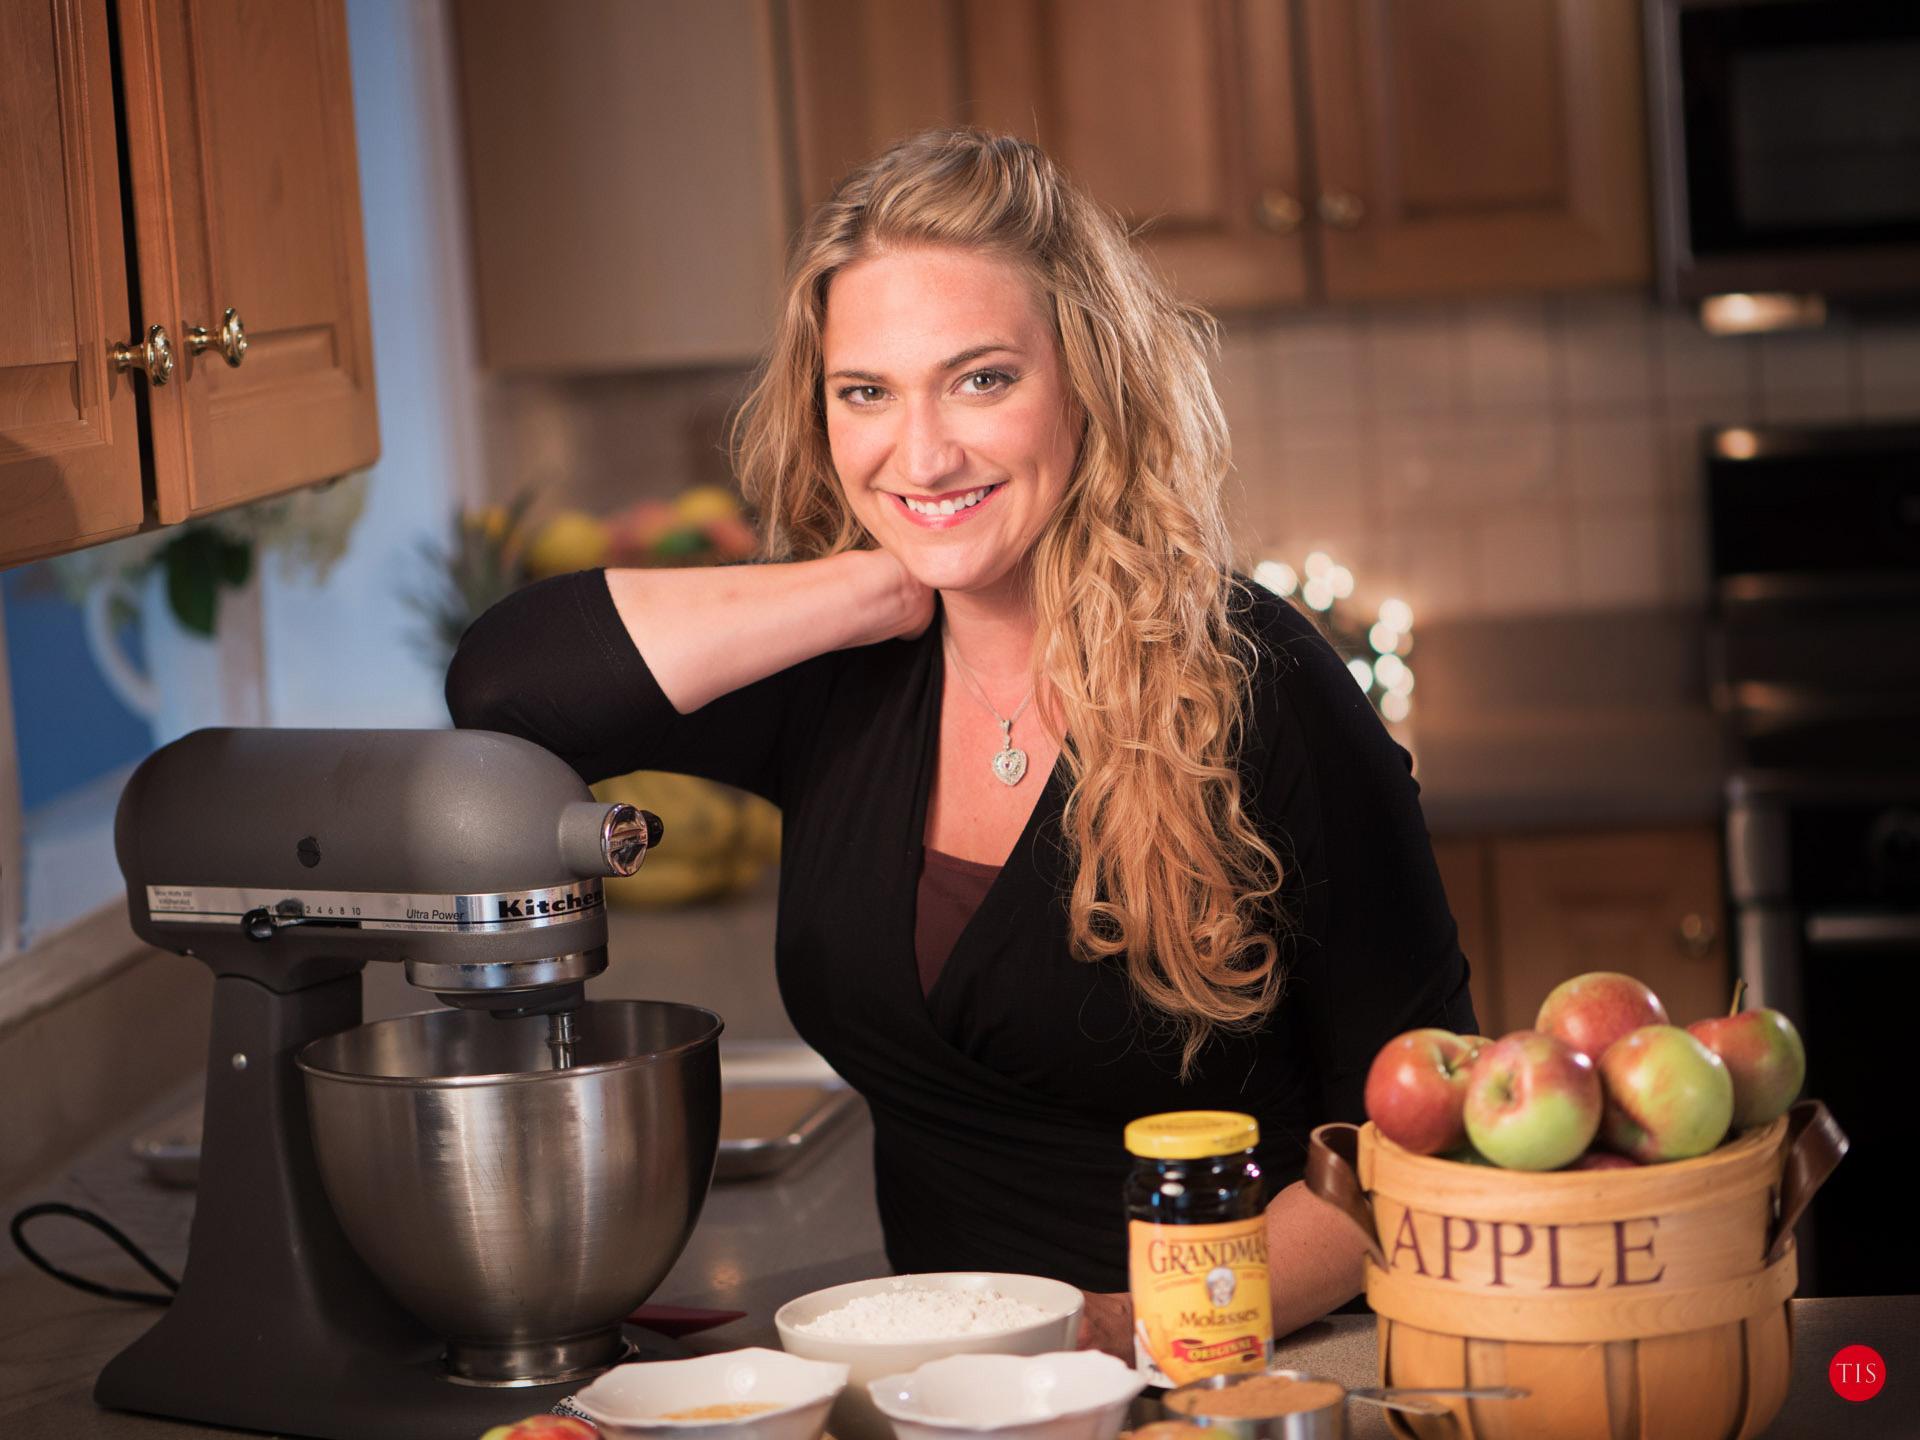 Apple Molasses Cookies by Jennifer Maring